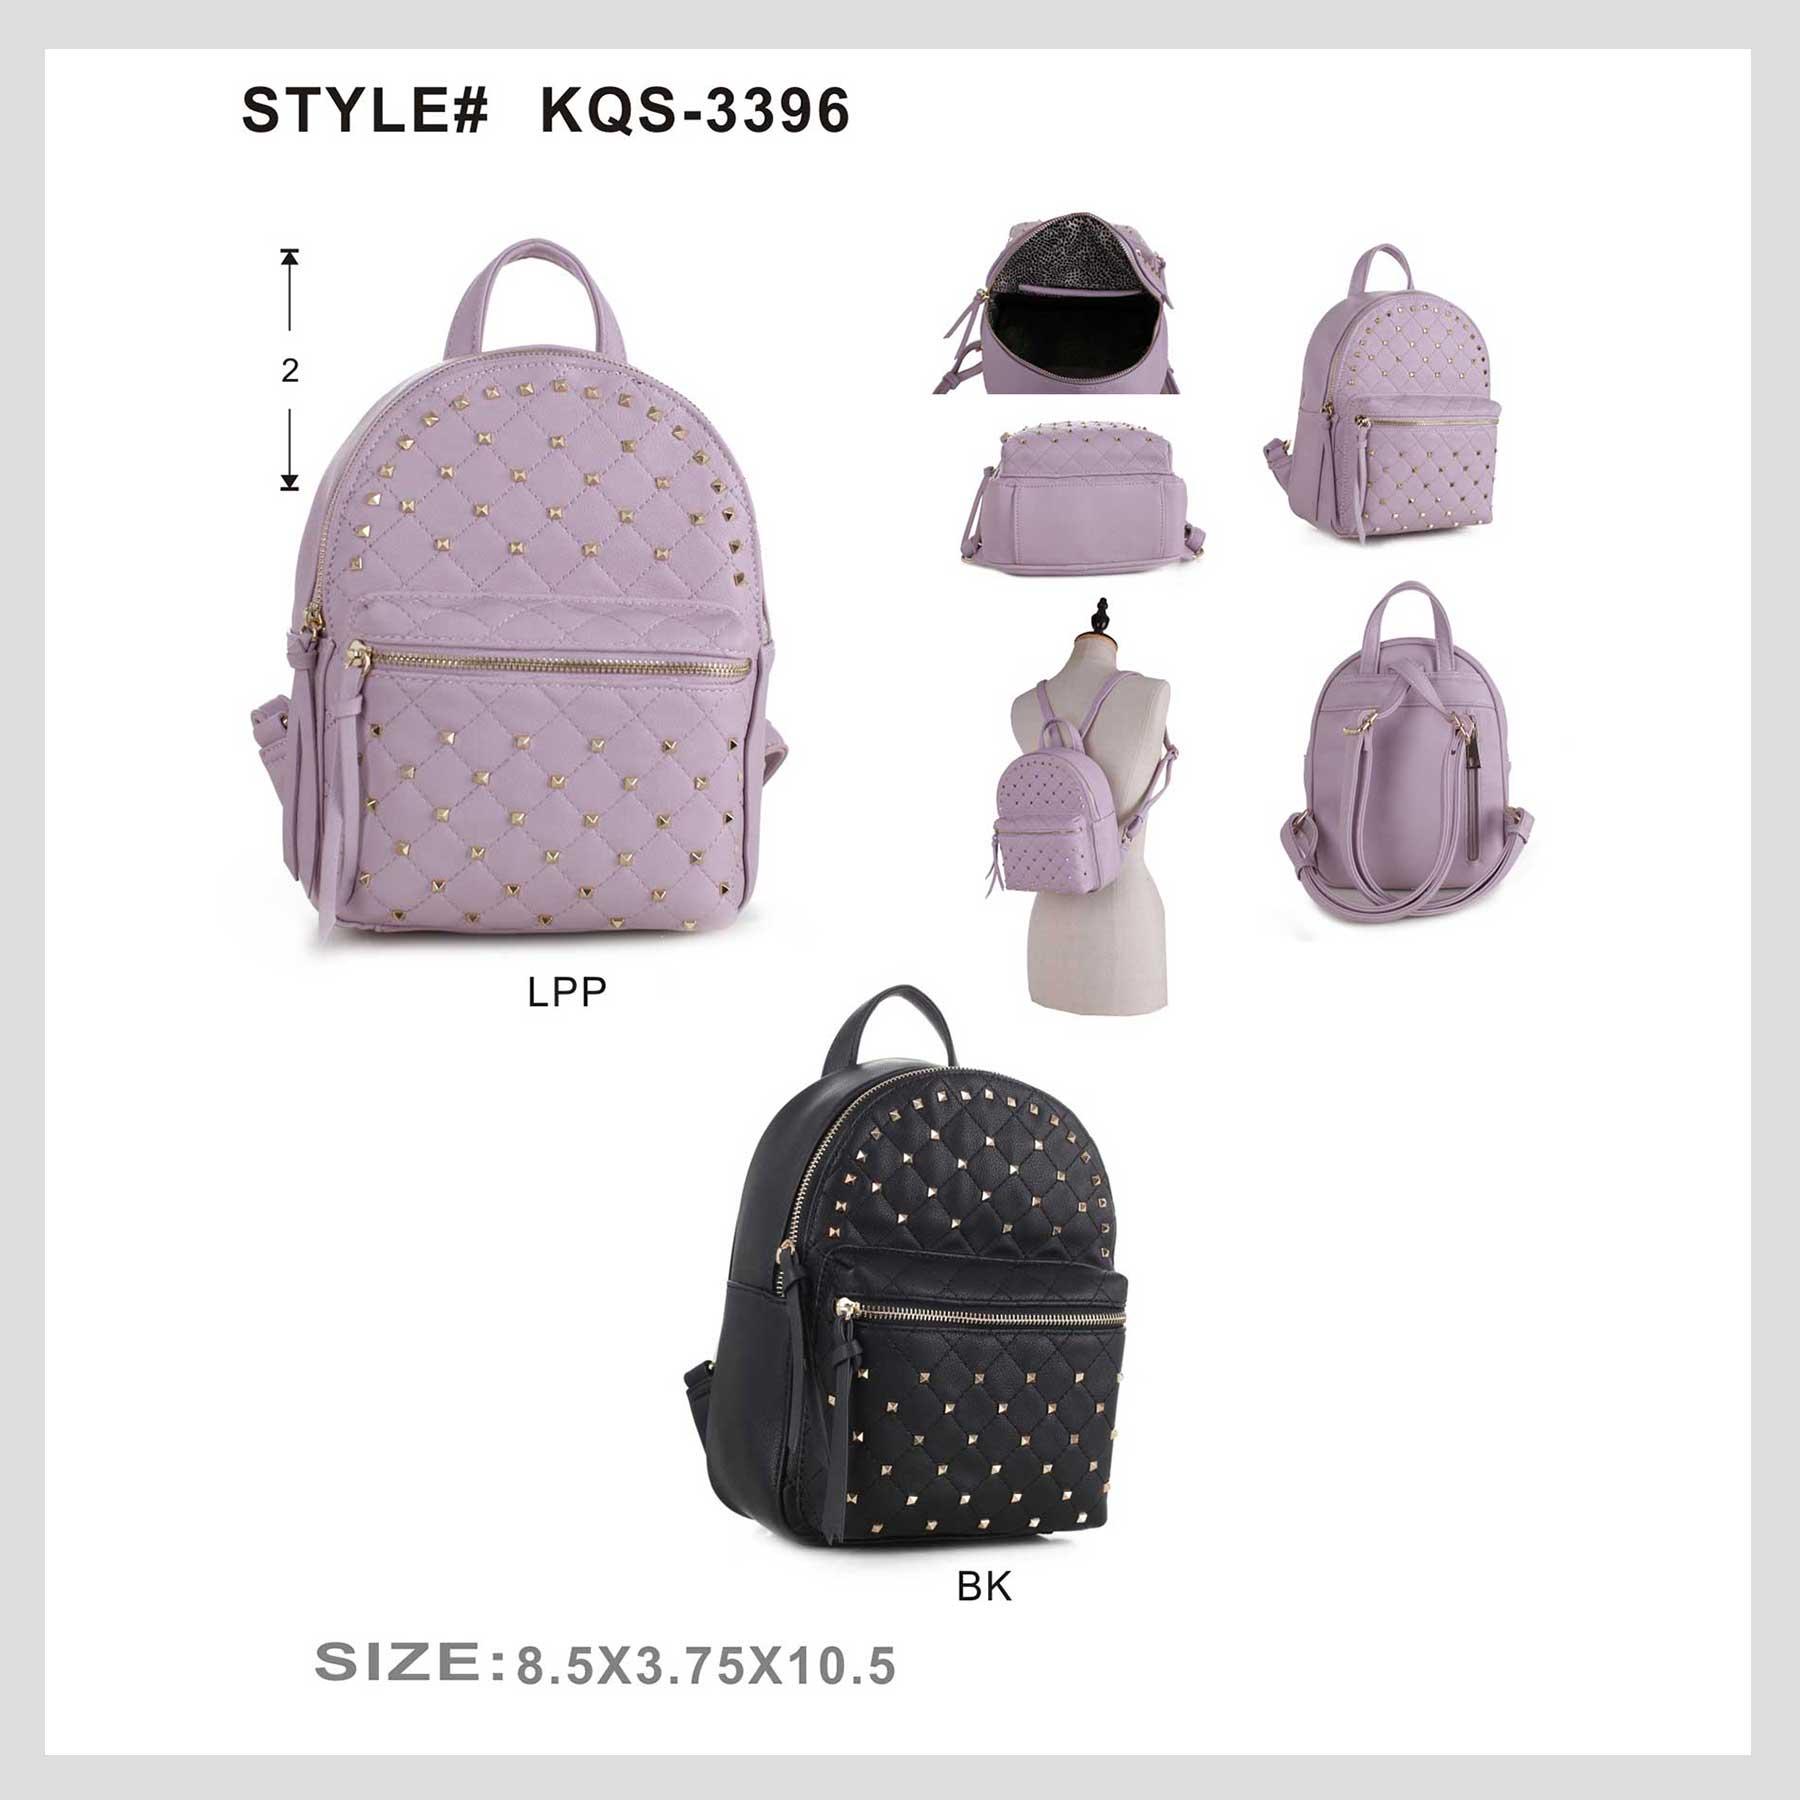 KQS-3396.jpg